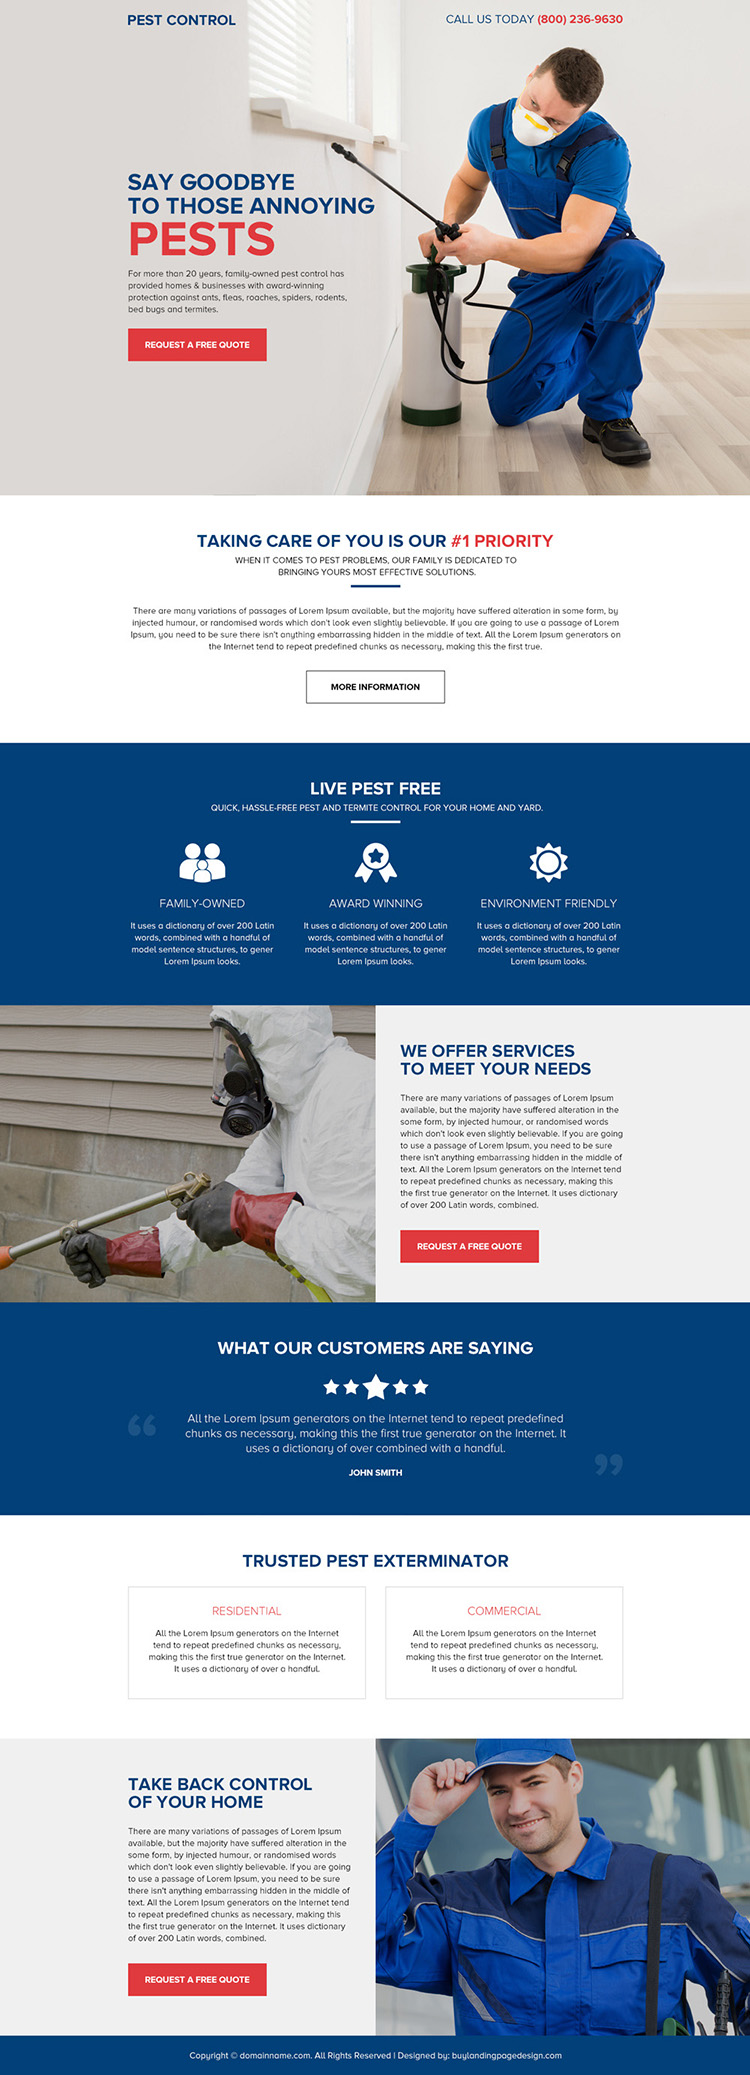 pest control services responsive landing page design